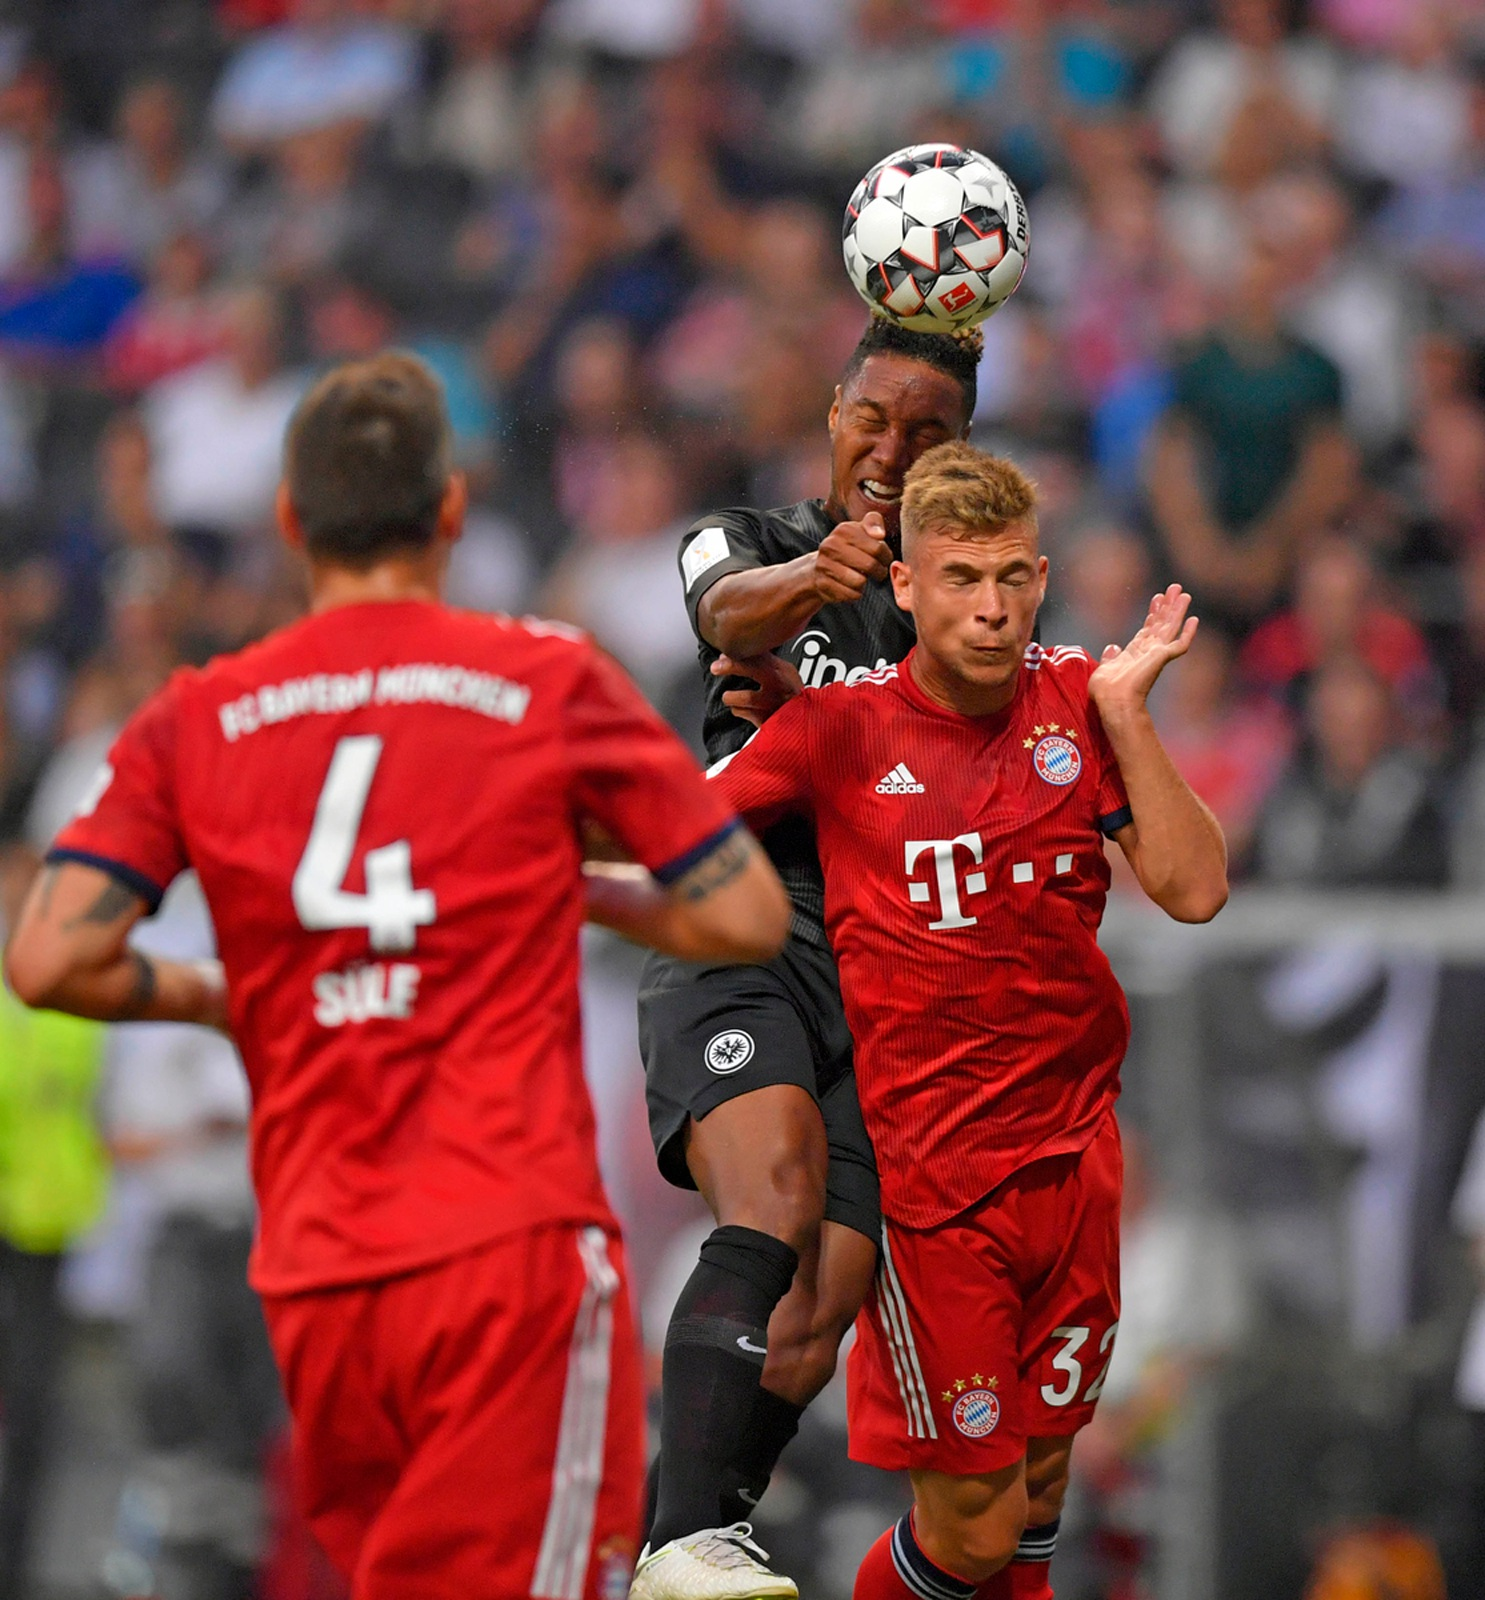 Supercup: UEFA-Supercup Ergebnisse